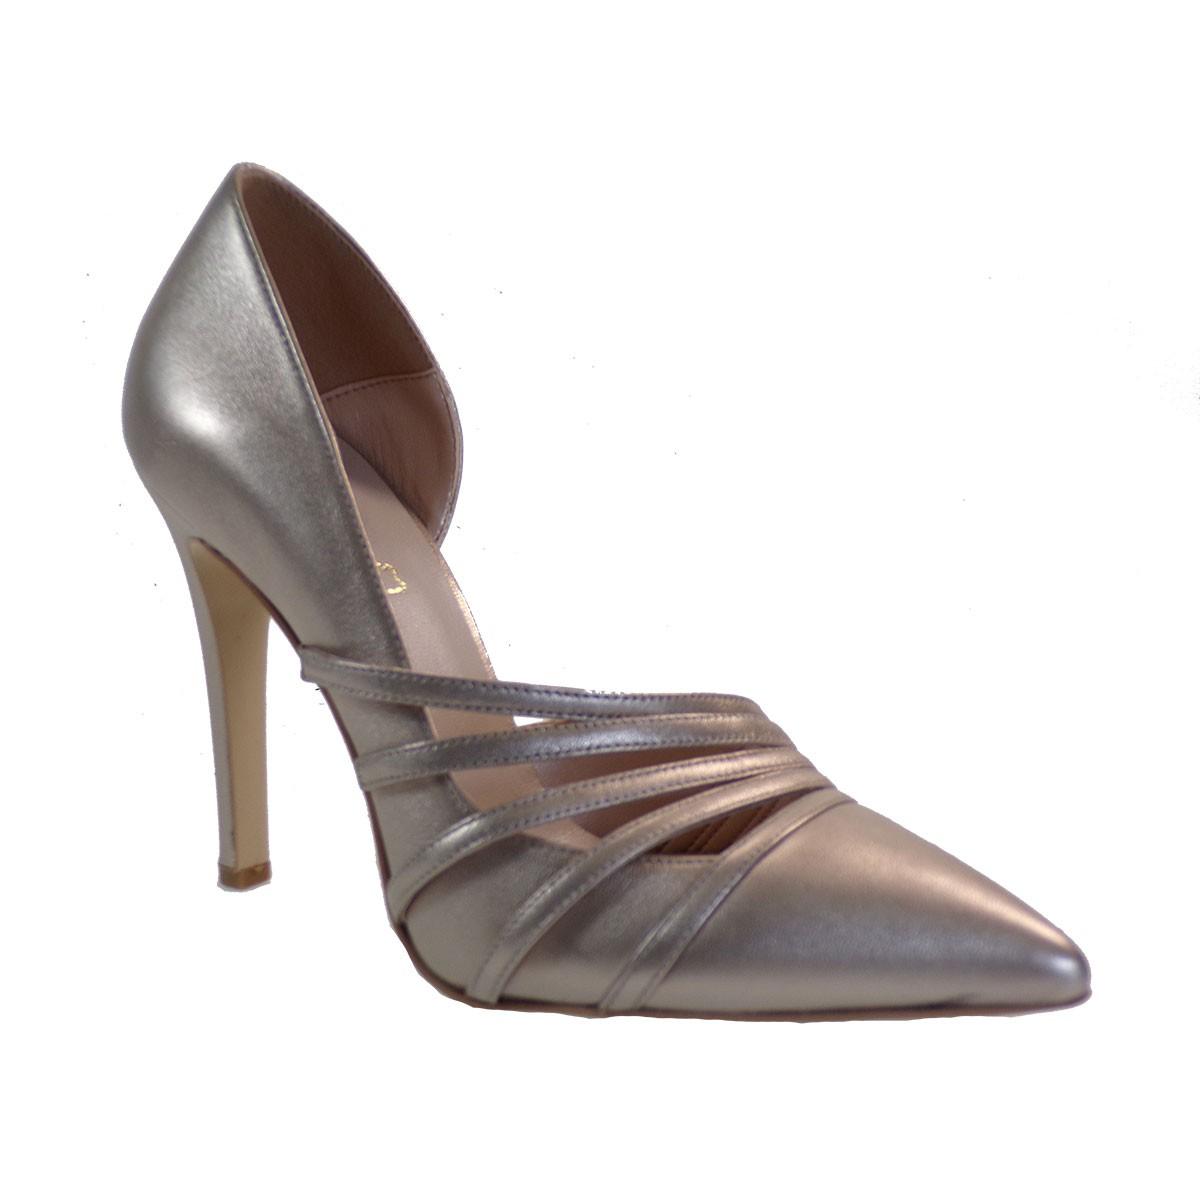 Fardoulis Shoes Γυναικεία Παπούτσια Γόβες 2306 Άμμος Δέρμα